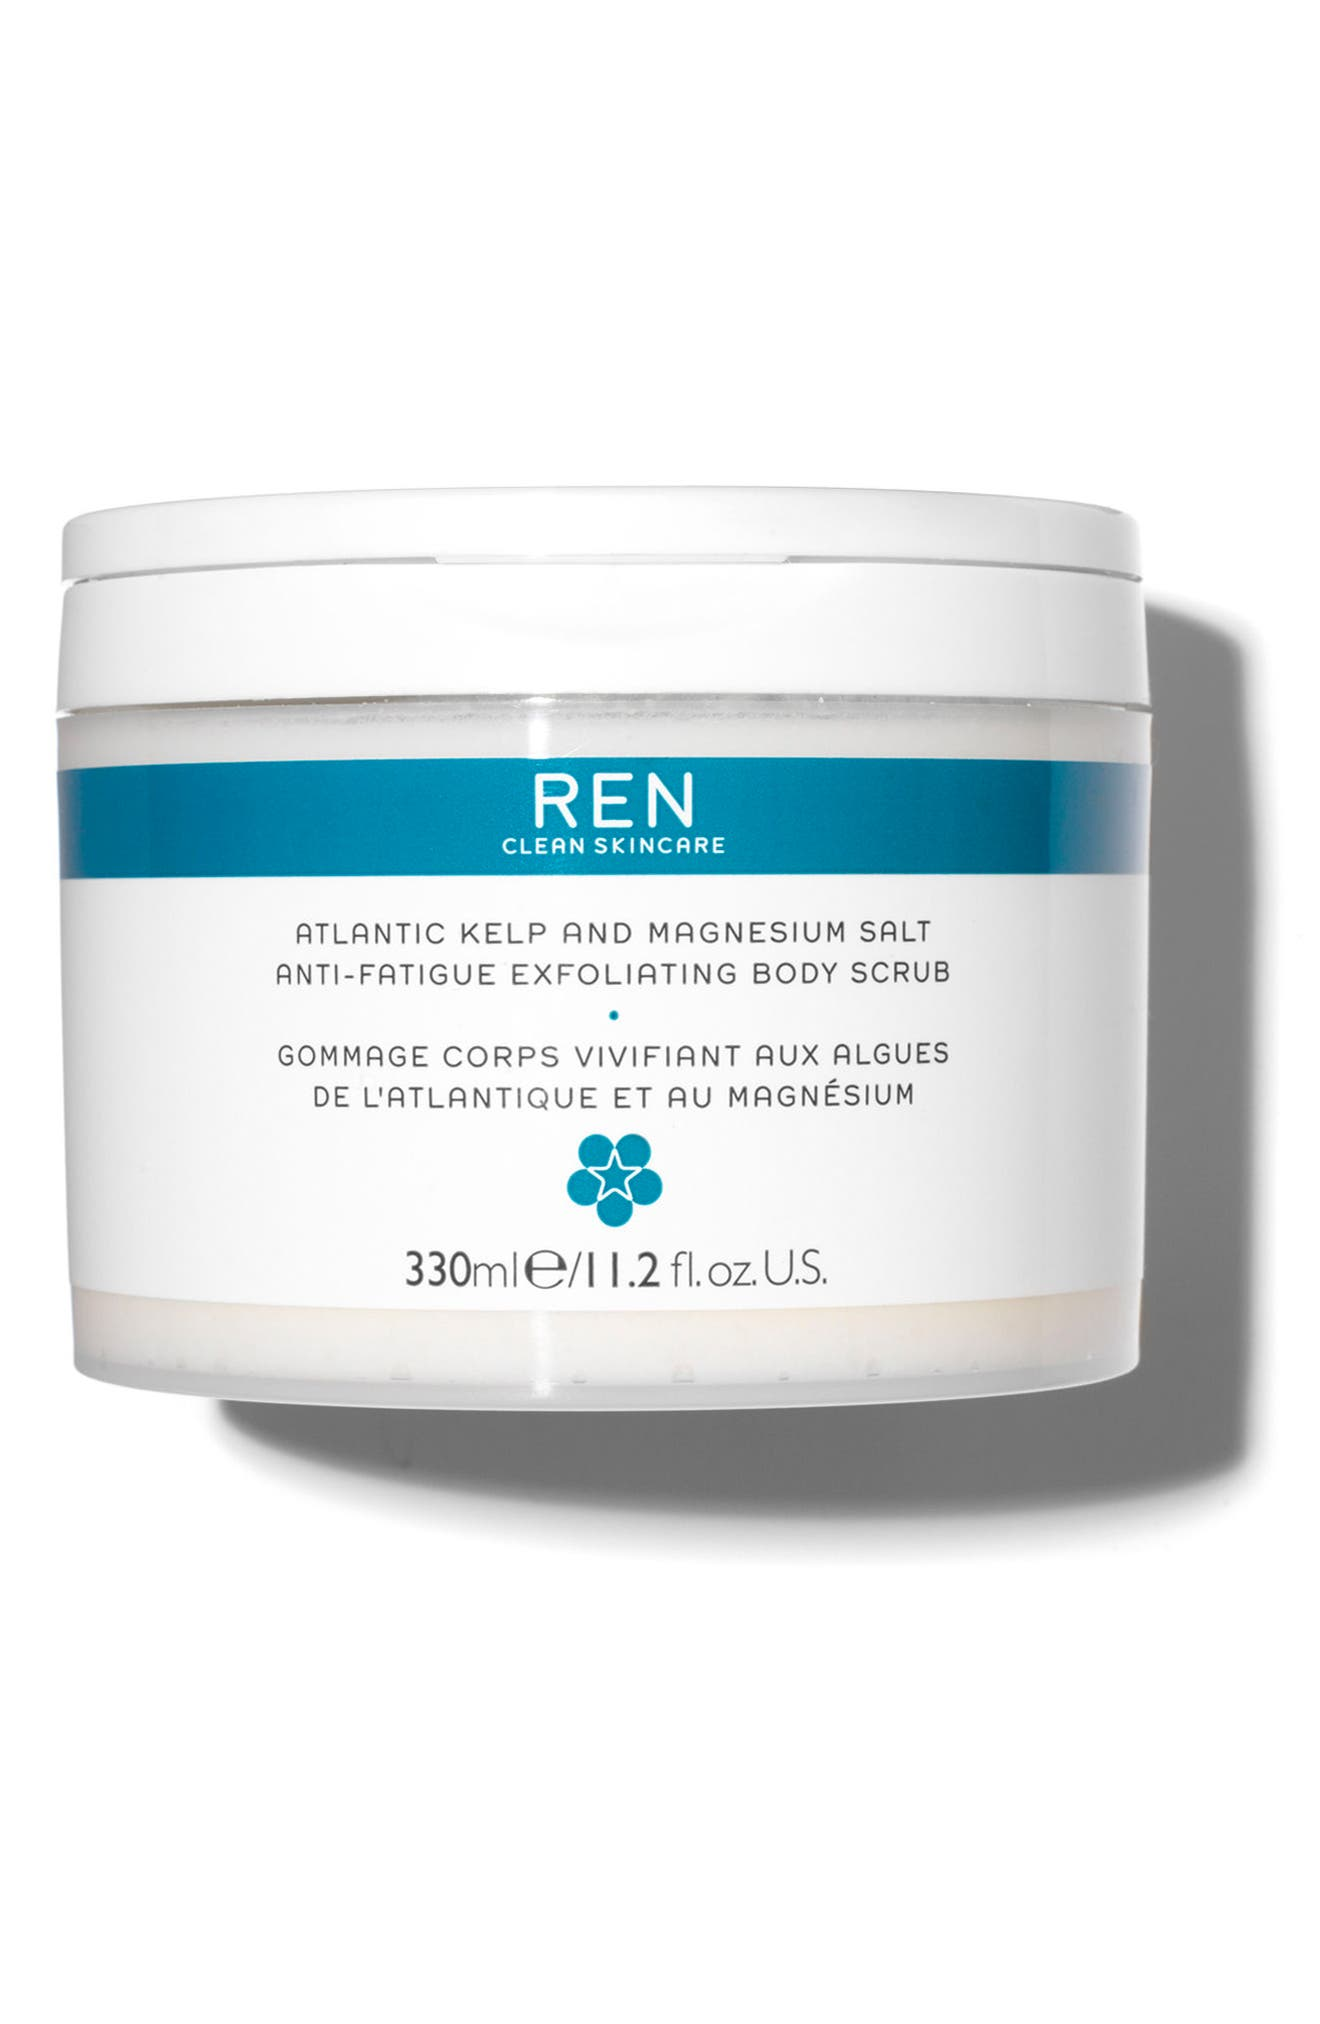 SPACE.NK.apothecary REN Atlantic Kelp and Magnesium Salt Anti-Fatigue Exfoliating Body Scrub,                             Main thumbnail 1, color,                             No Color